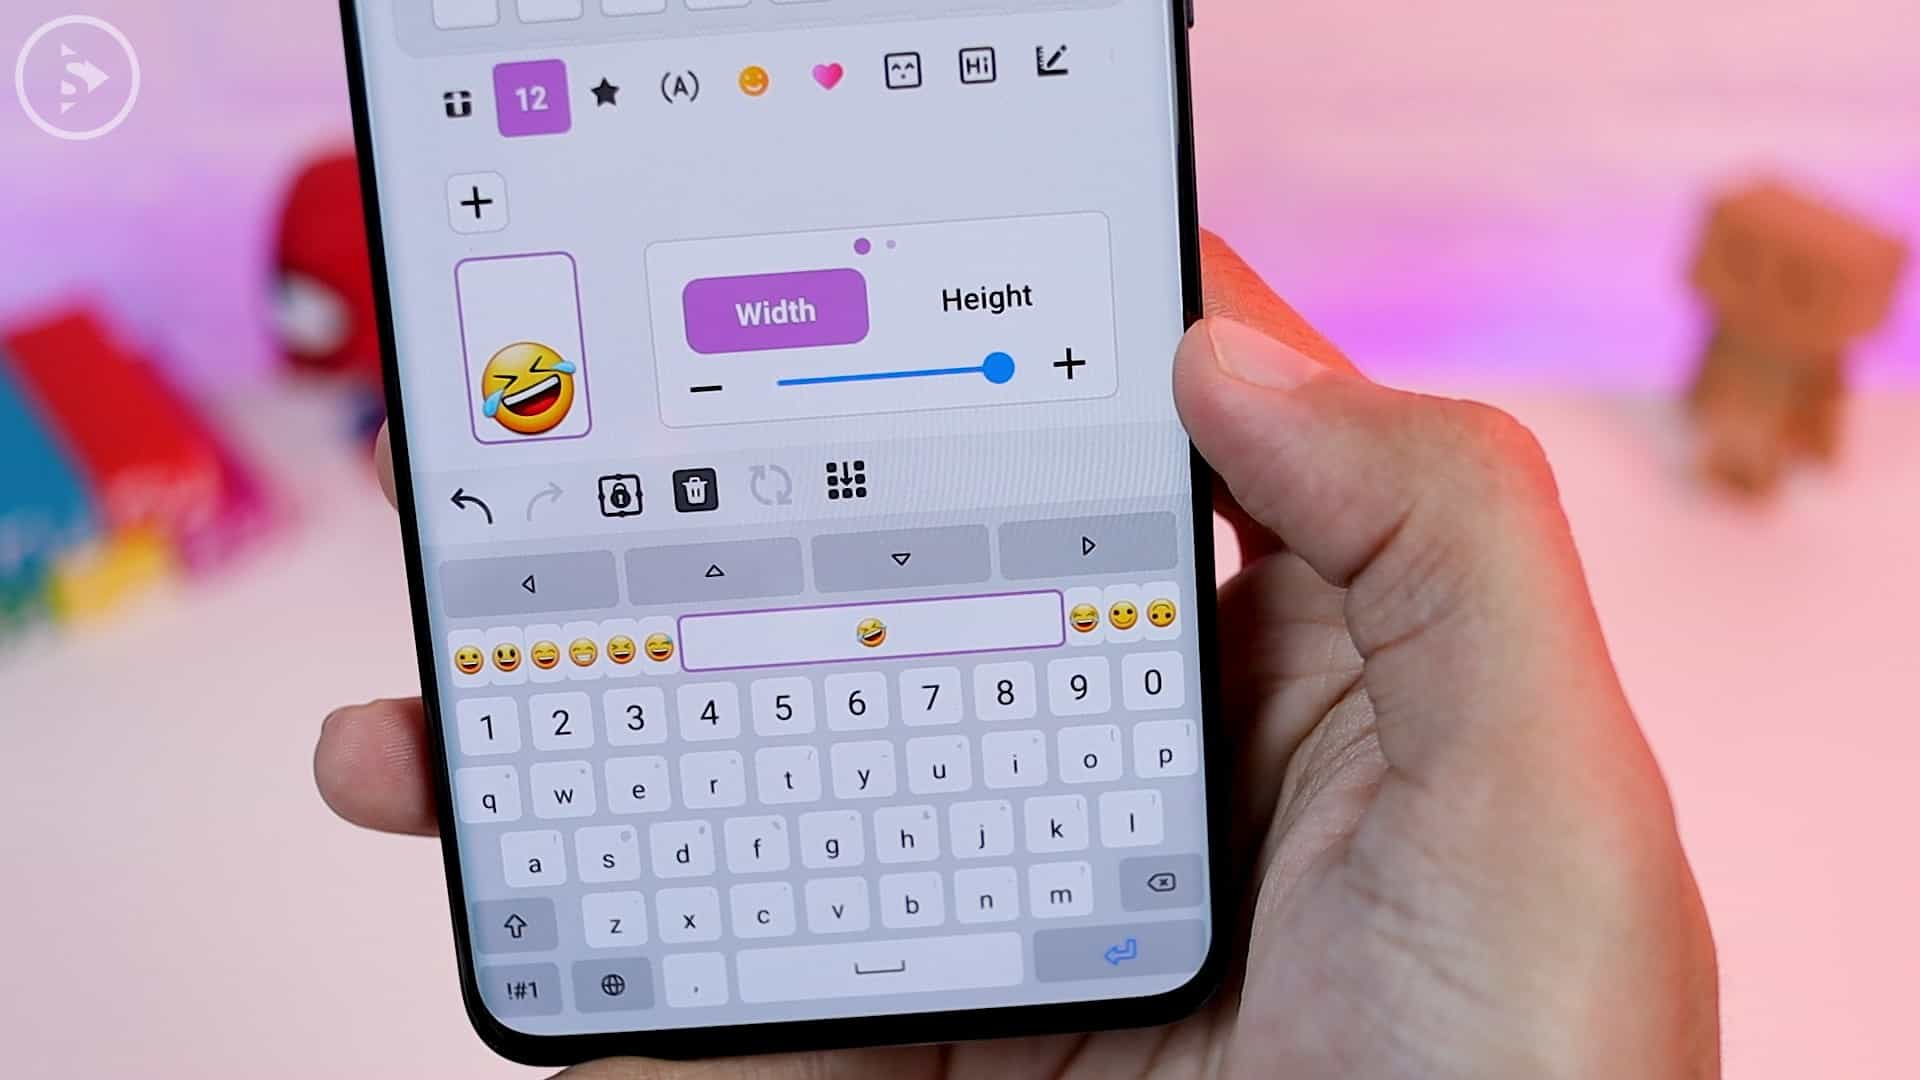 Tips Aplikasi Keys Cafe Terbaru Good Lock - Setting ukuran emoji dengan klik tanda plus